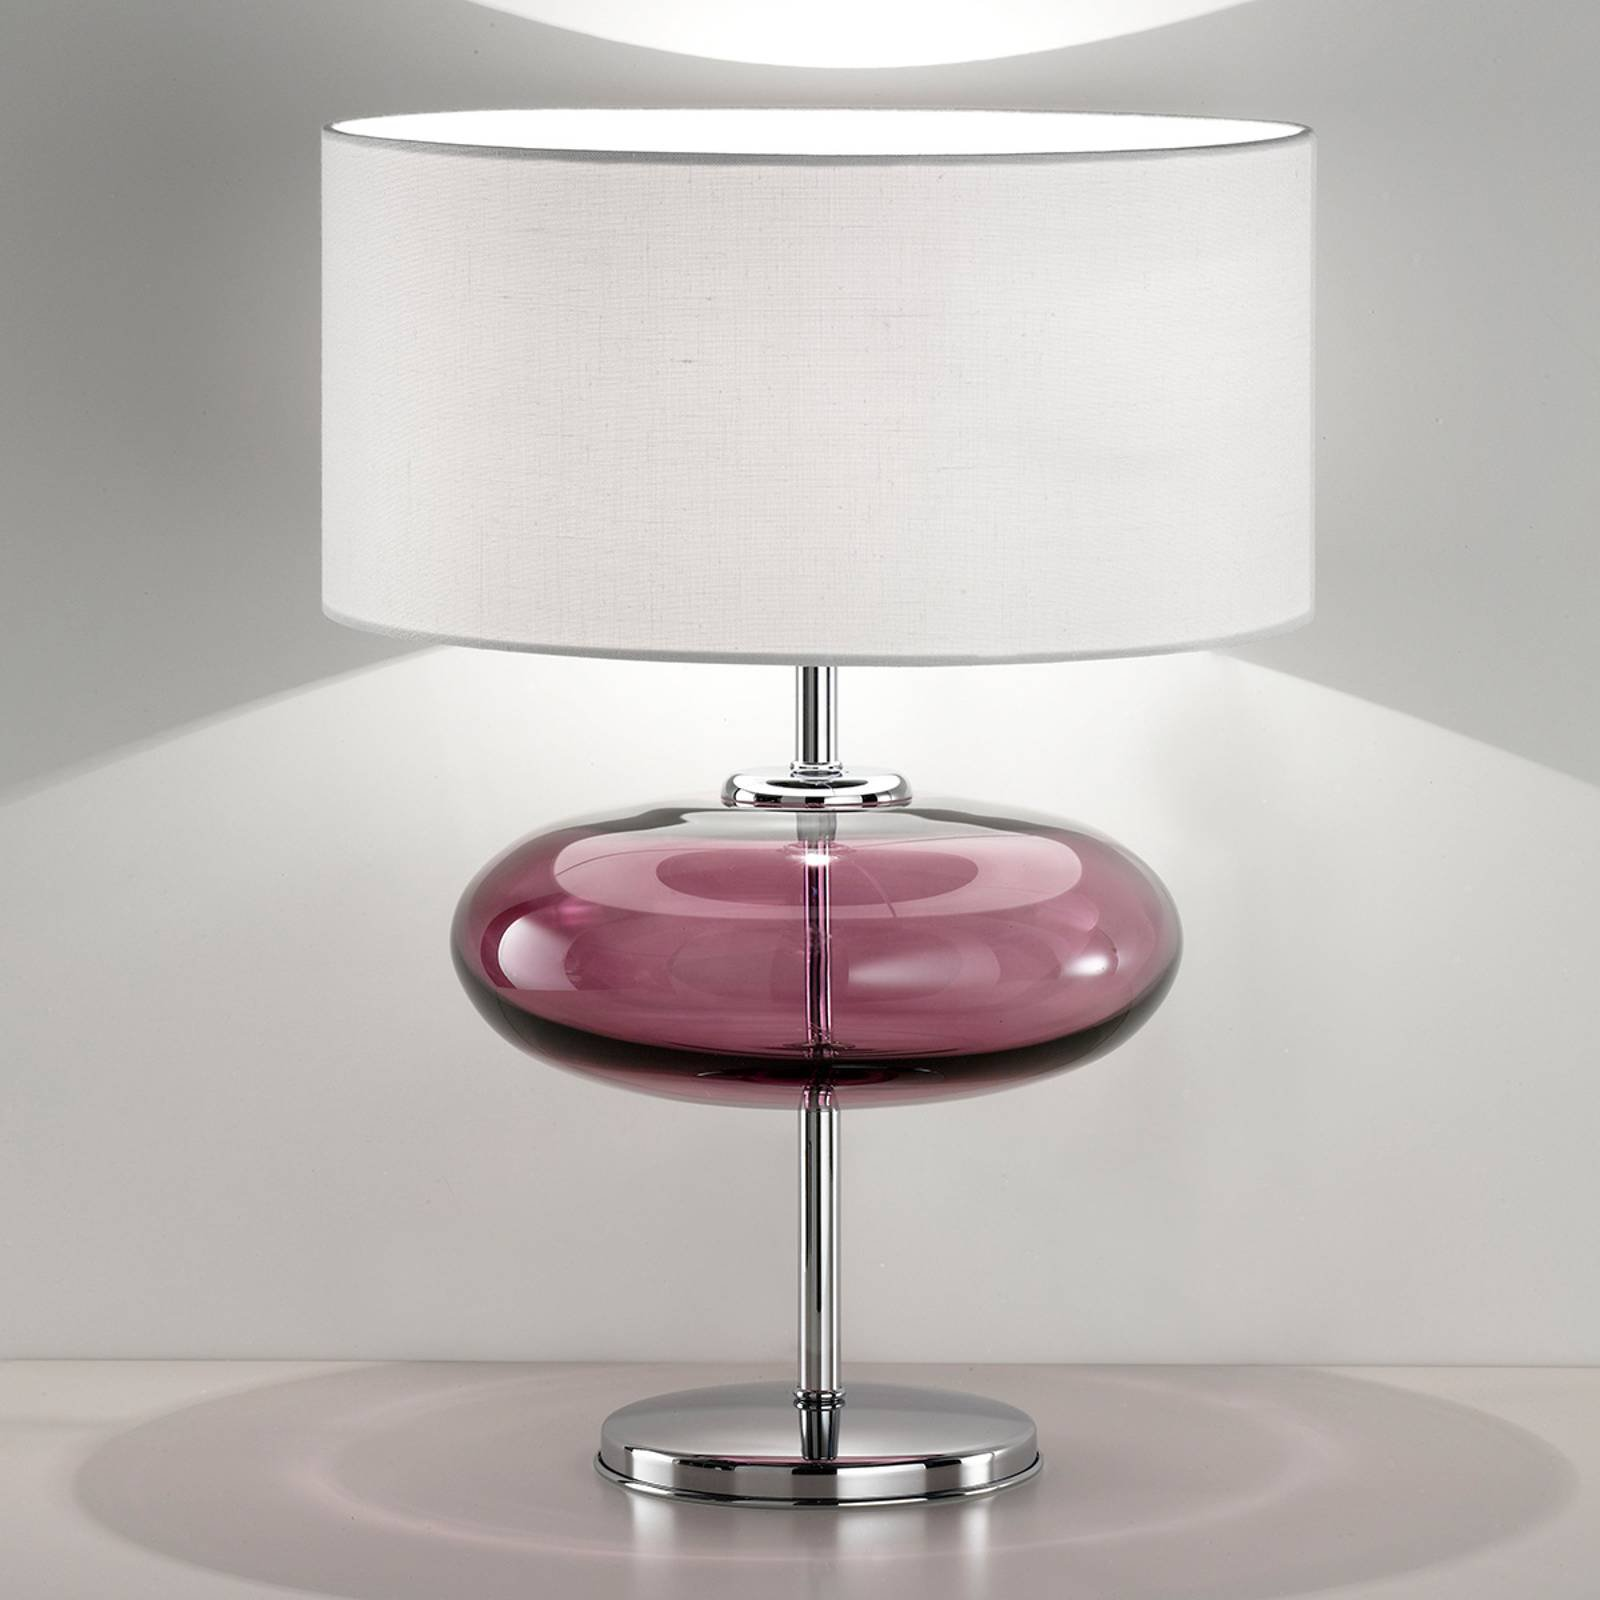 Bordlampe Show Elisse 62 cm glasselement rosa